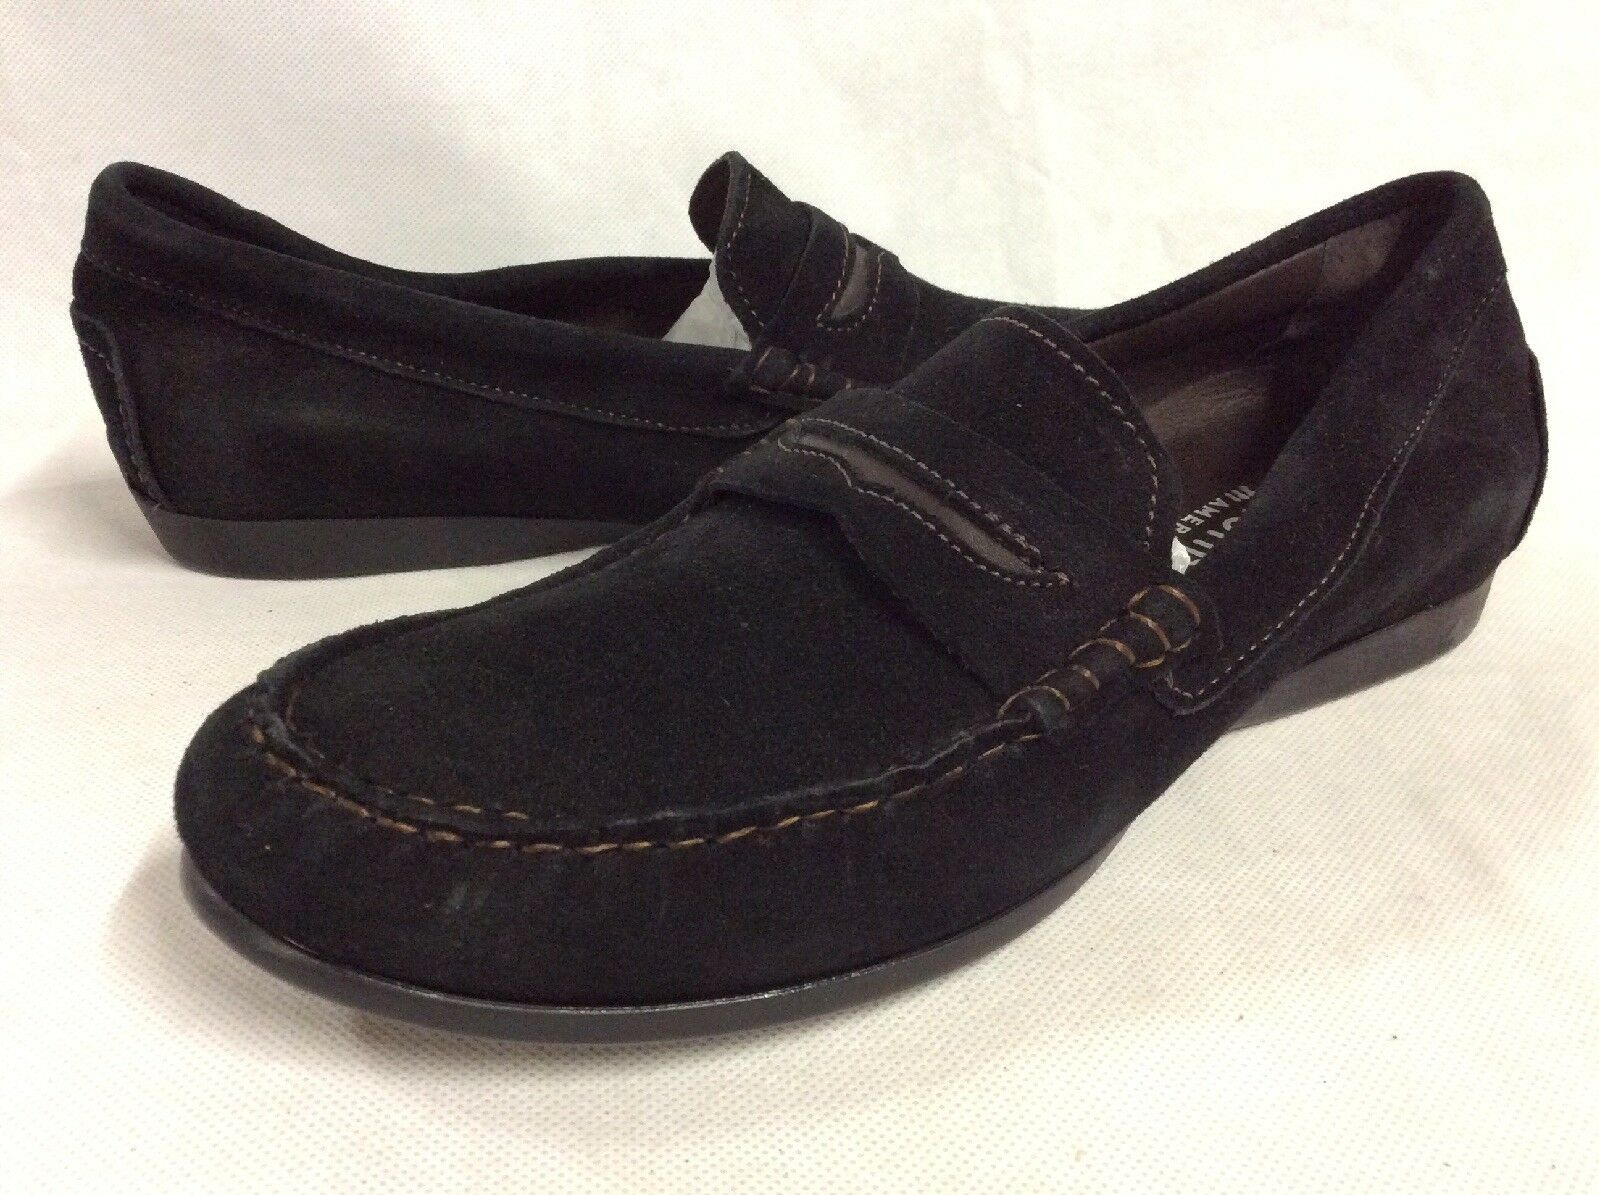 Munro Women's shoes Comfort, Black, Size 7.5 M...MUNRO 1